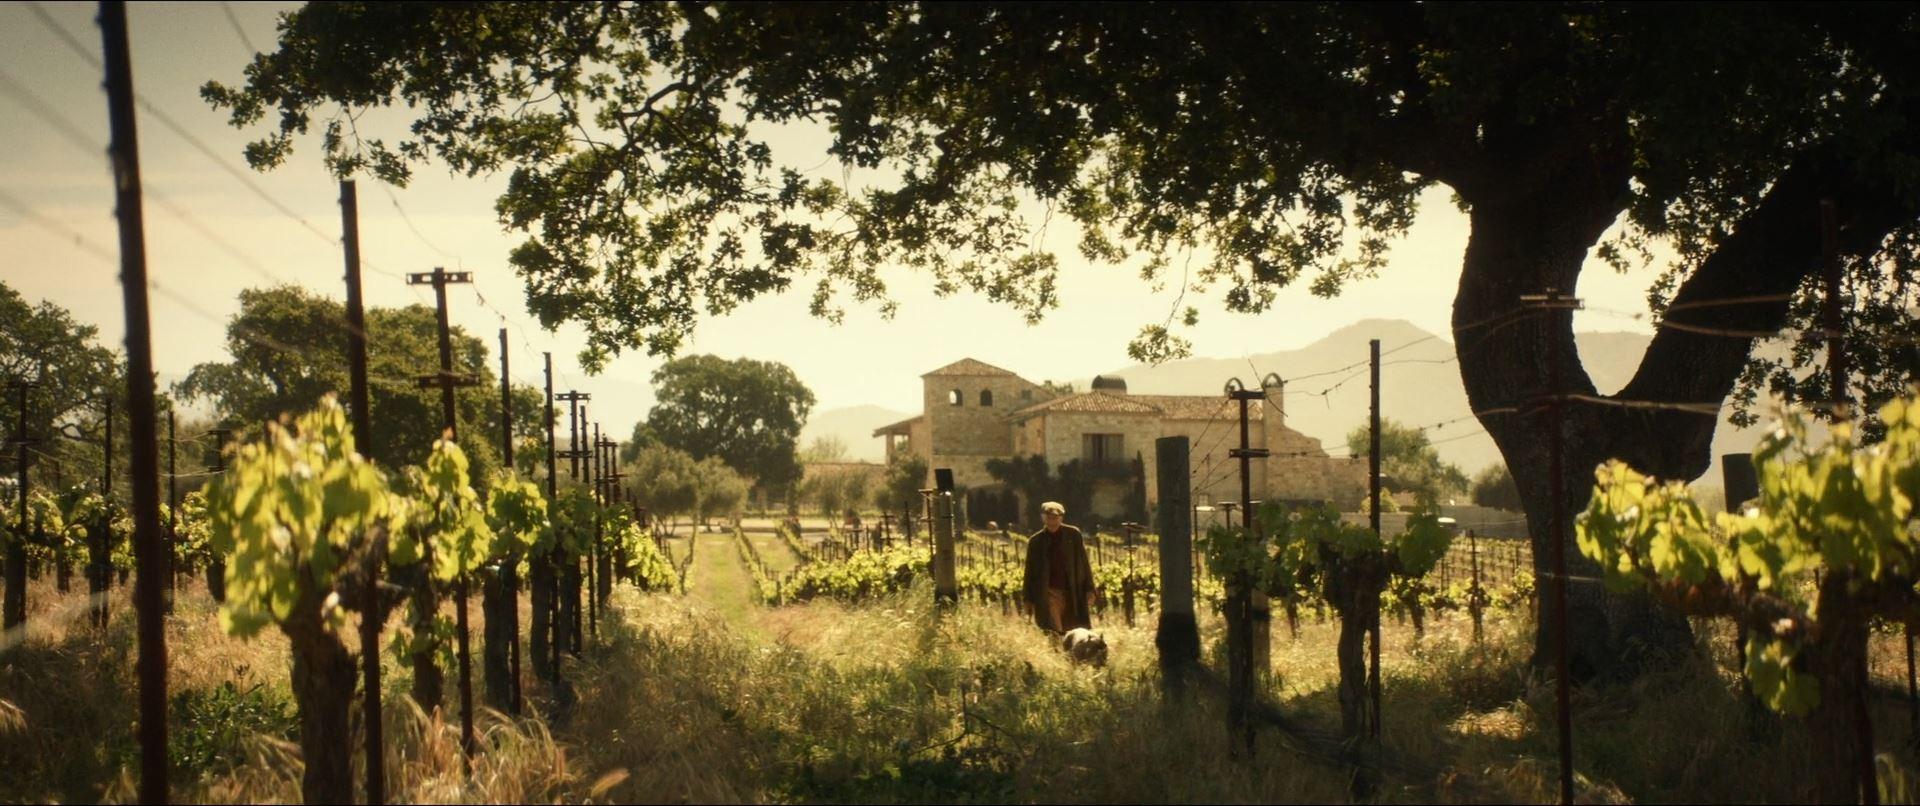 Star Trek Picard - Jean-Luc Picard on his vineyard